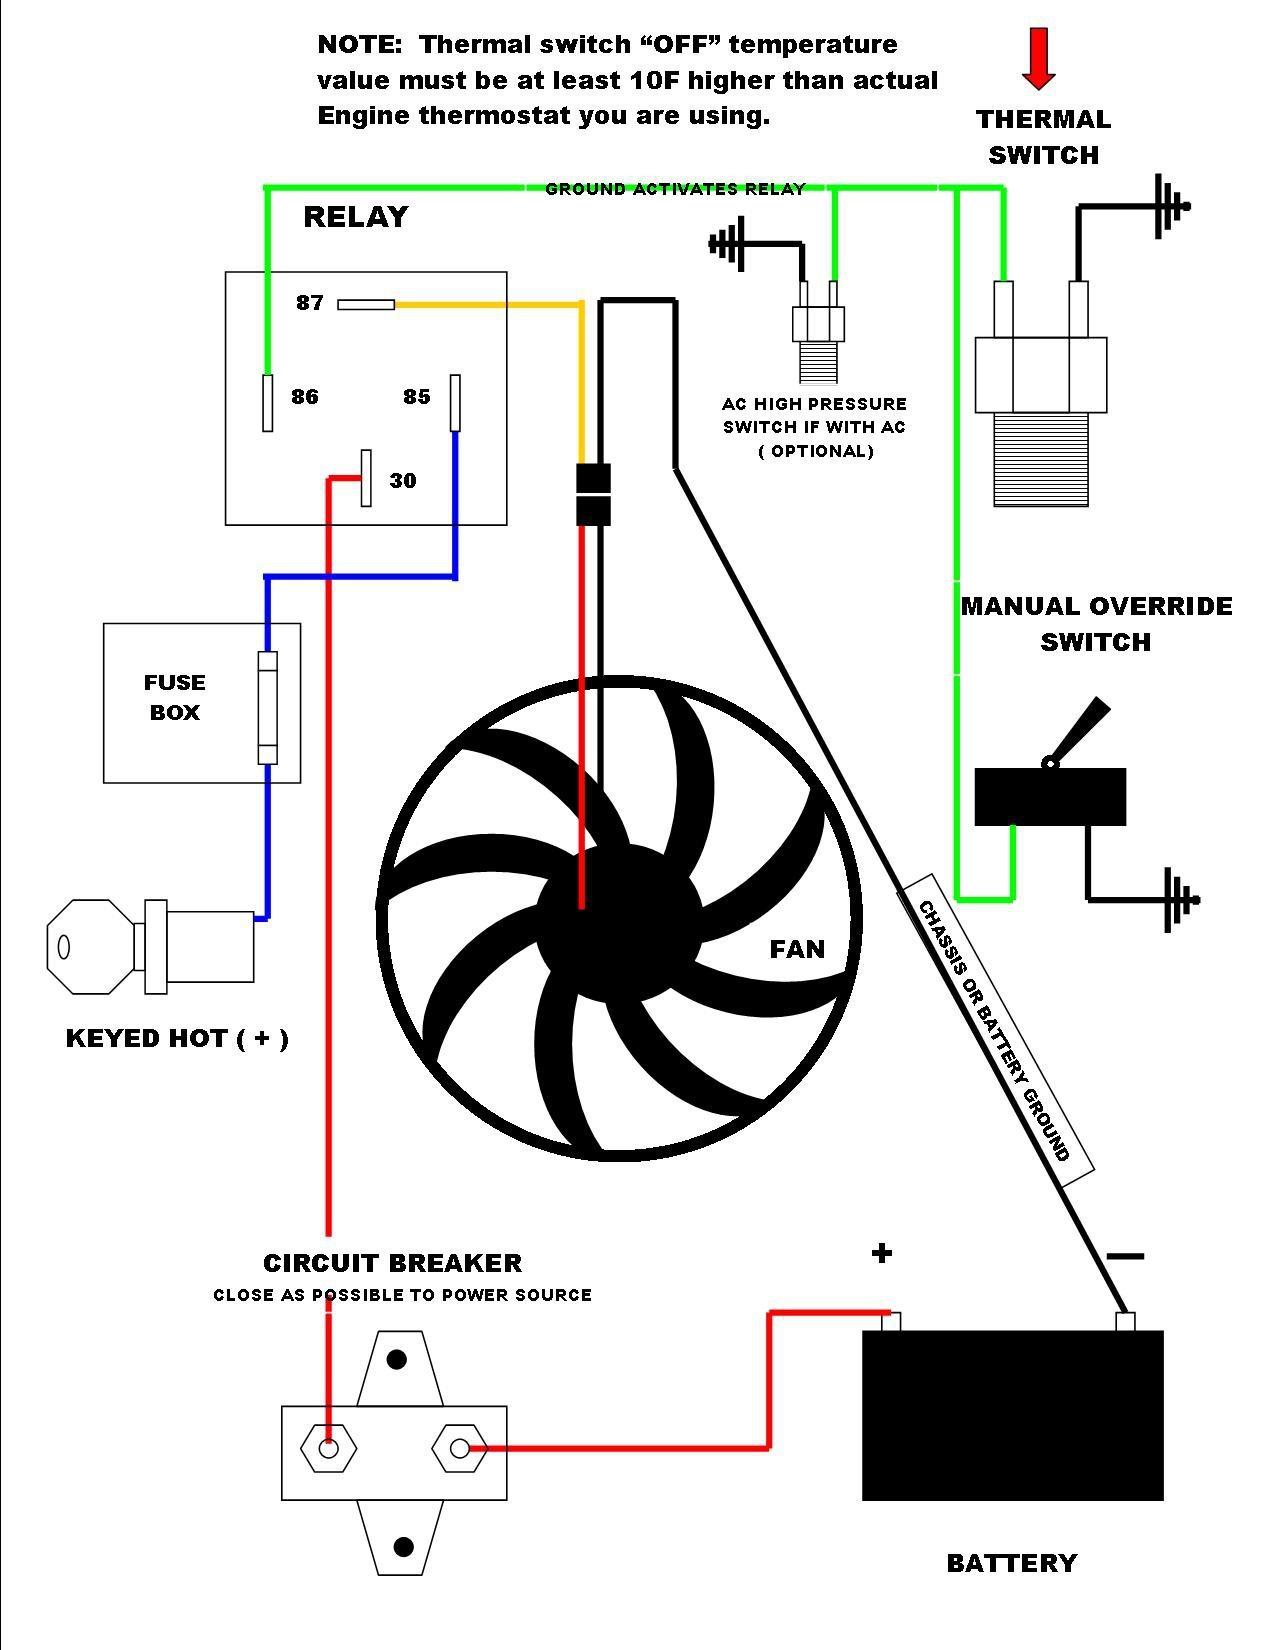 Electric Fan Wiring Diagram Best Amazing Dual Cooling Fan Wiring Diagram Ideas Electrical and